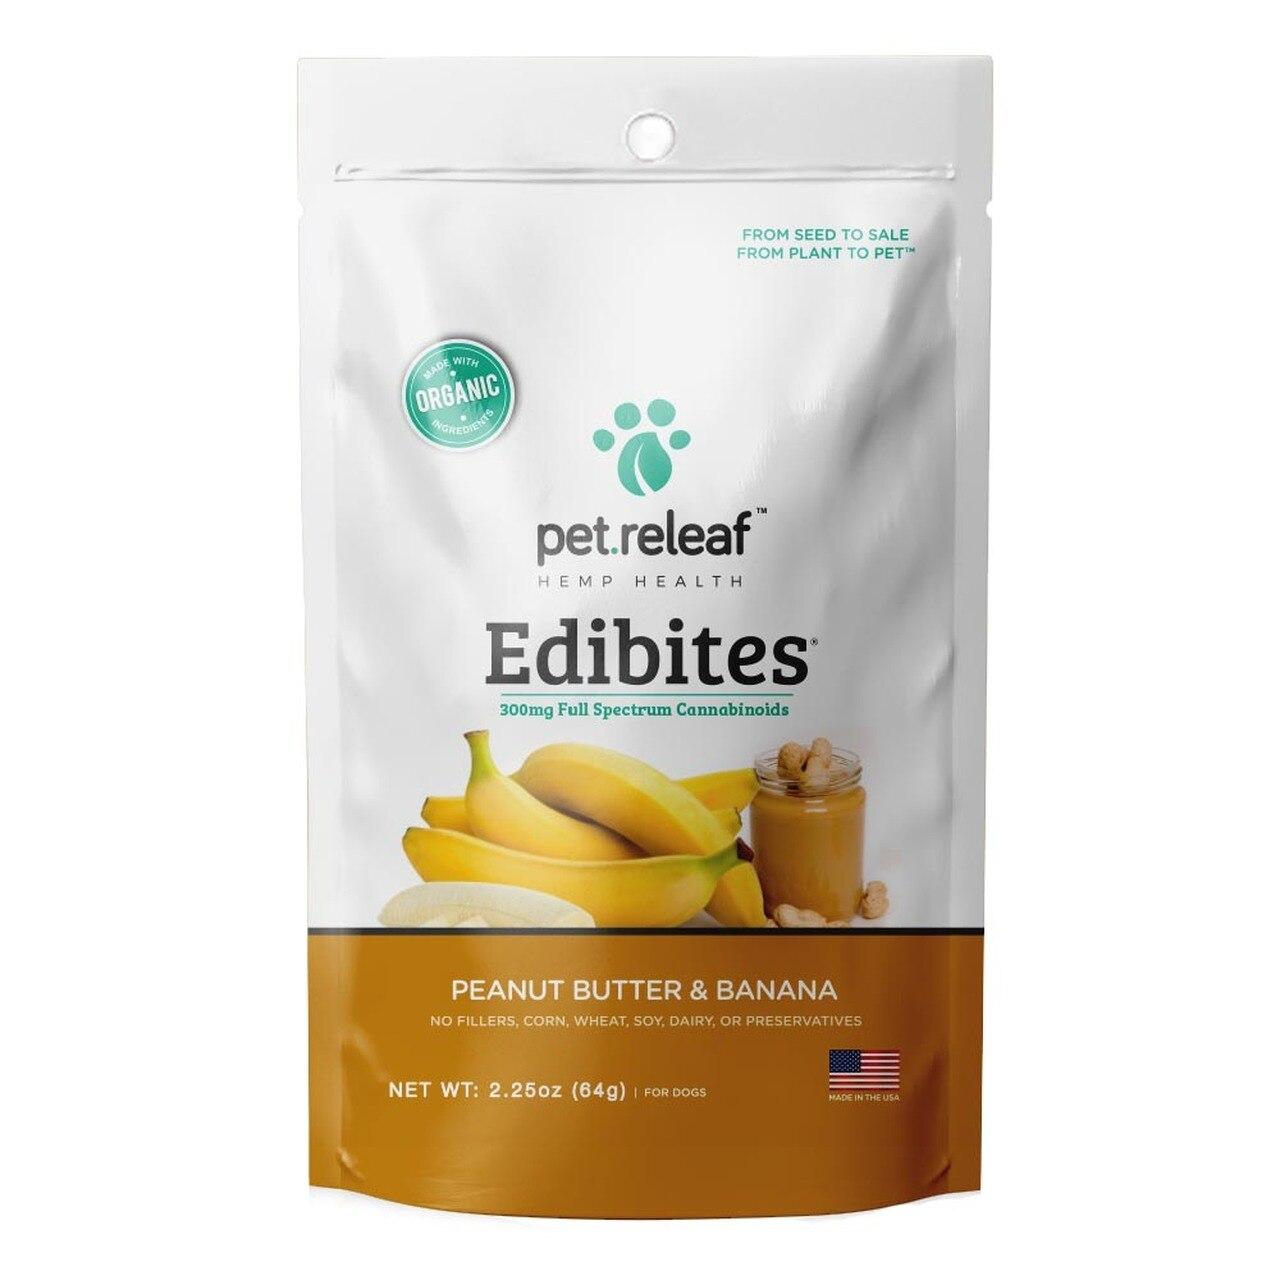 Pet Releaf Edibites Peanut Butter & Banana Dog Treats, 2.25-oz